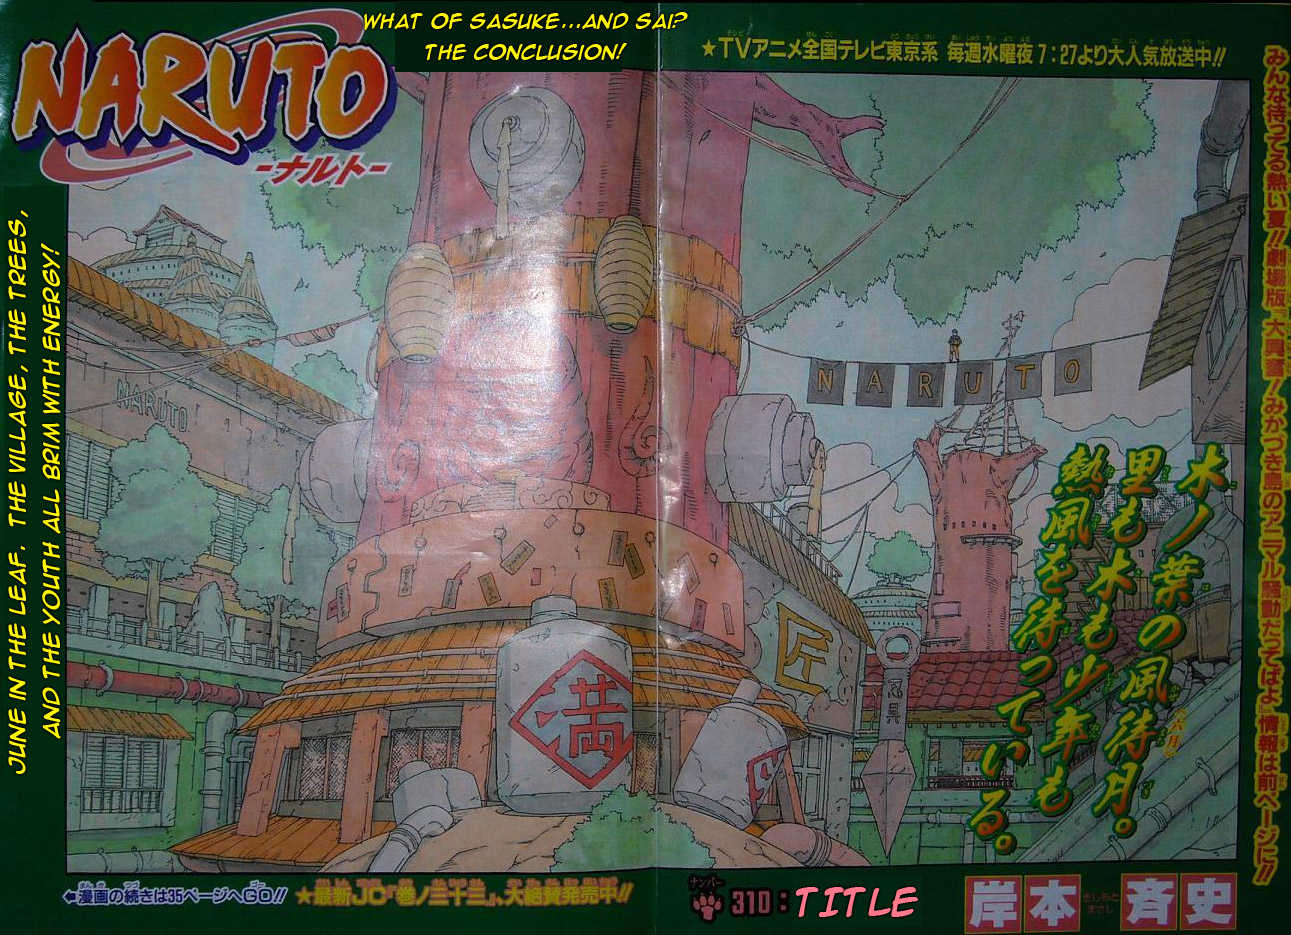 https://im.nineanime.com/comics/pic9/33/289/22664/Naruto3100947.jpg Page 1